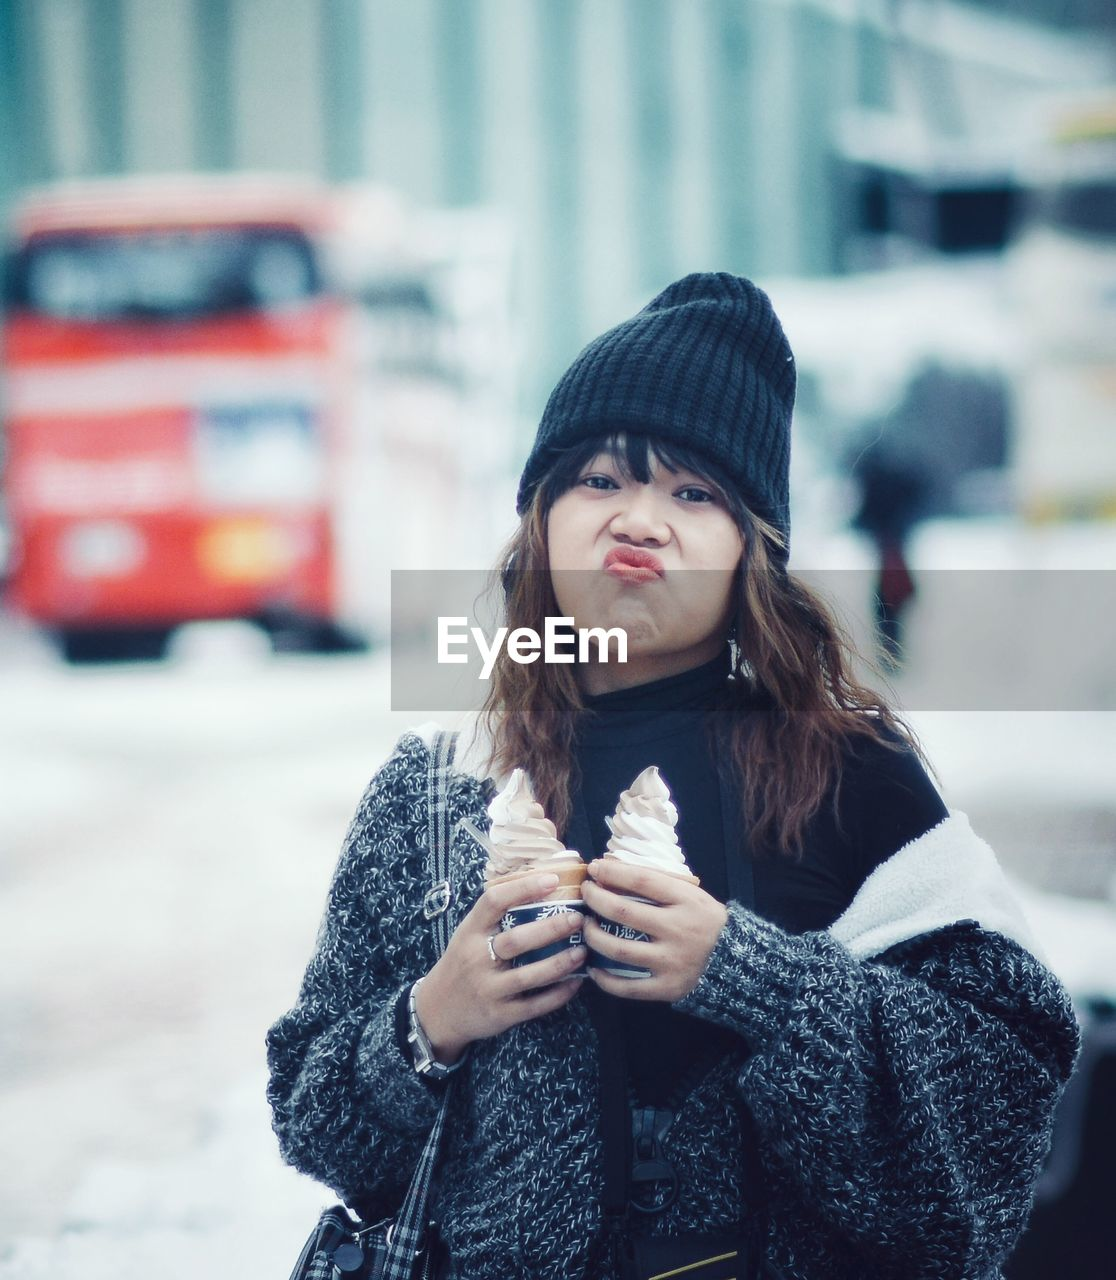 Portrait Of Girl Holding Ice Creams